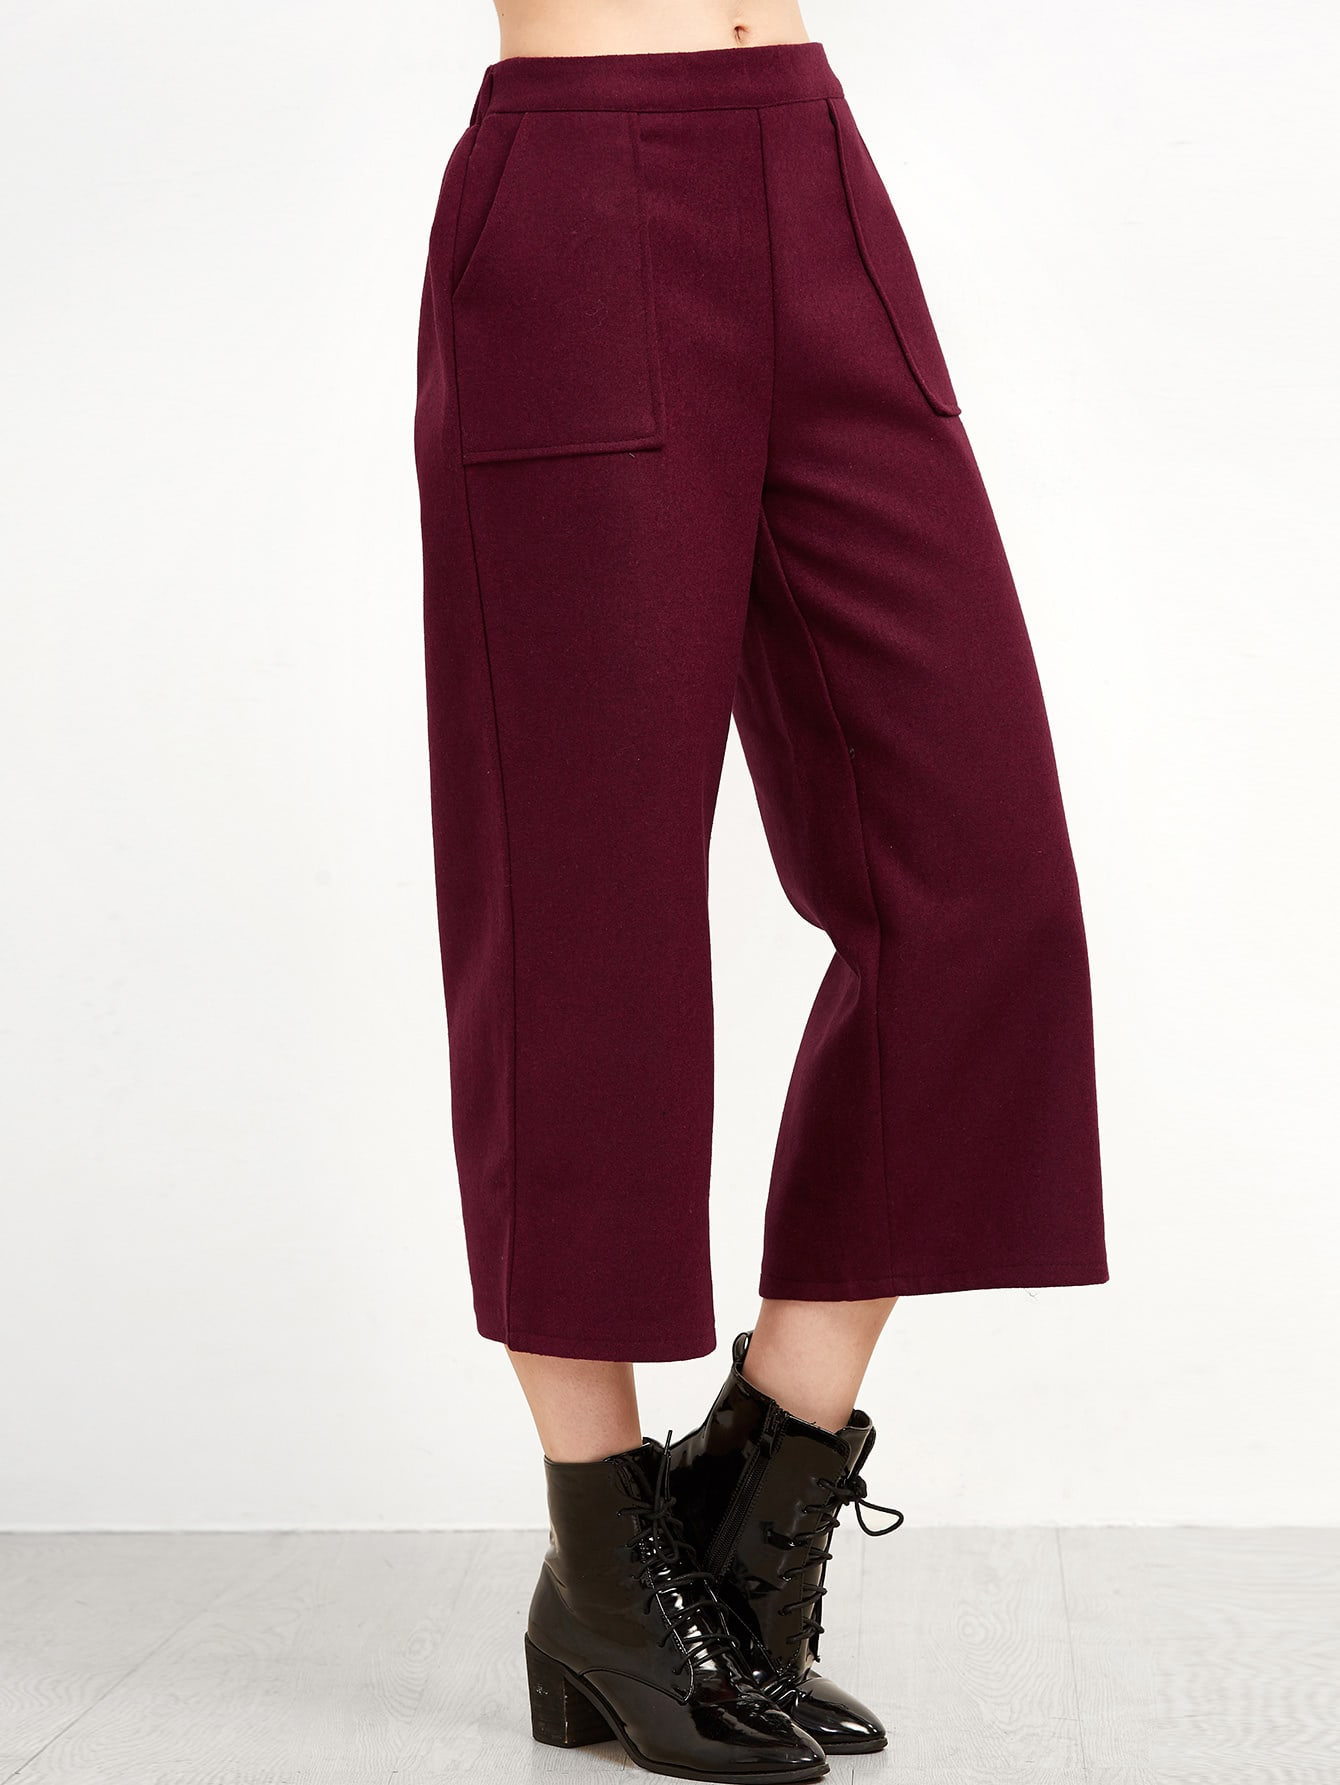 Burgundy Wide Leg Front Pockets Pants pants161004101